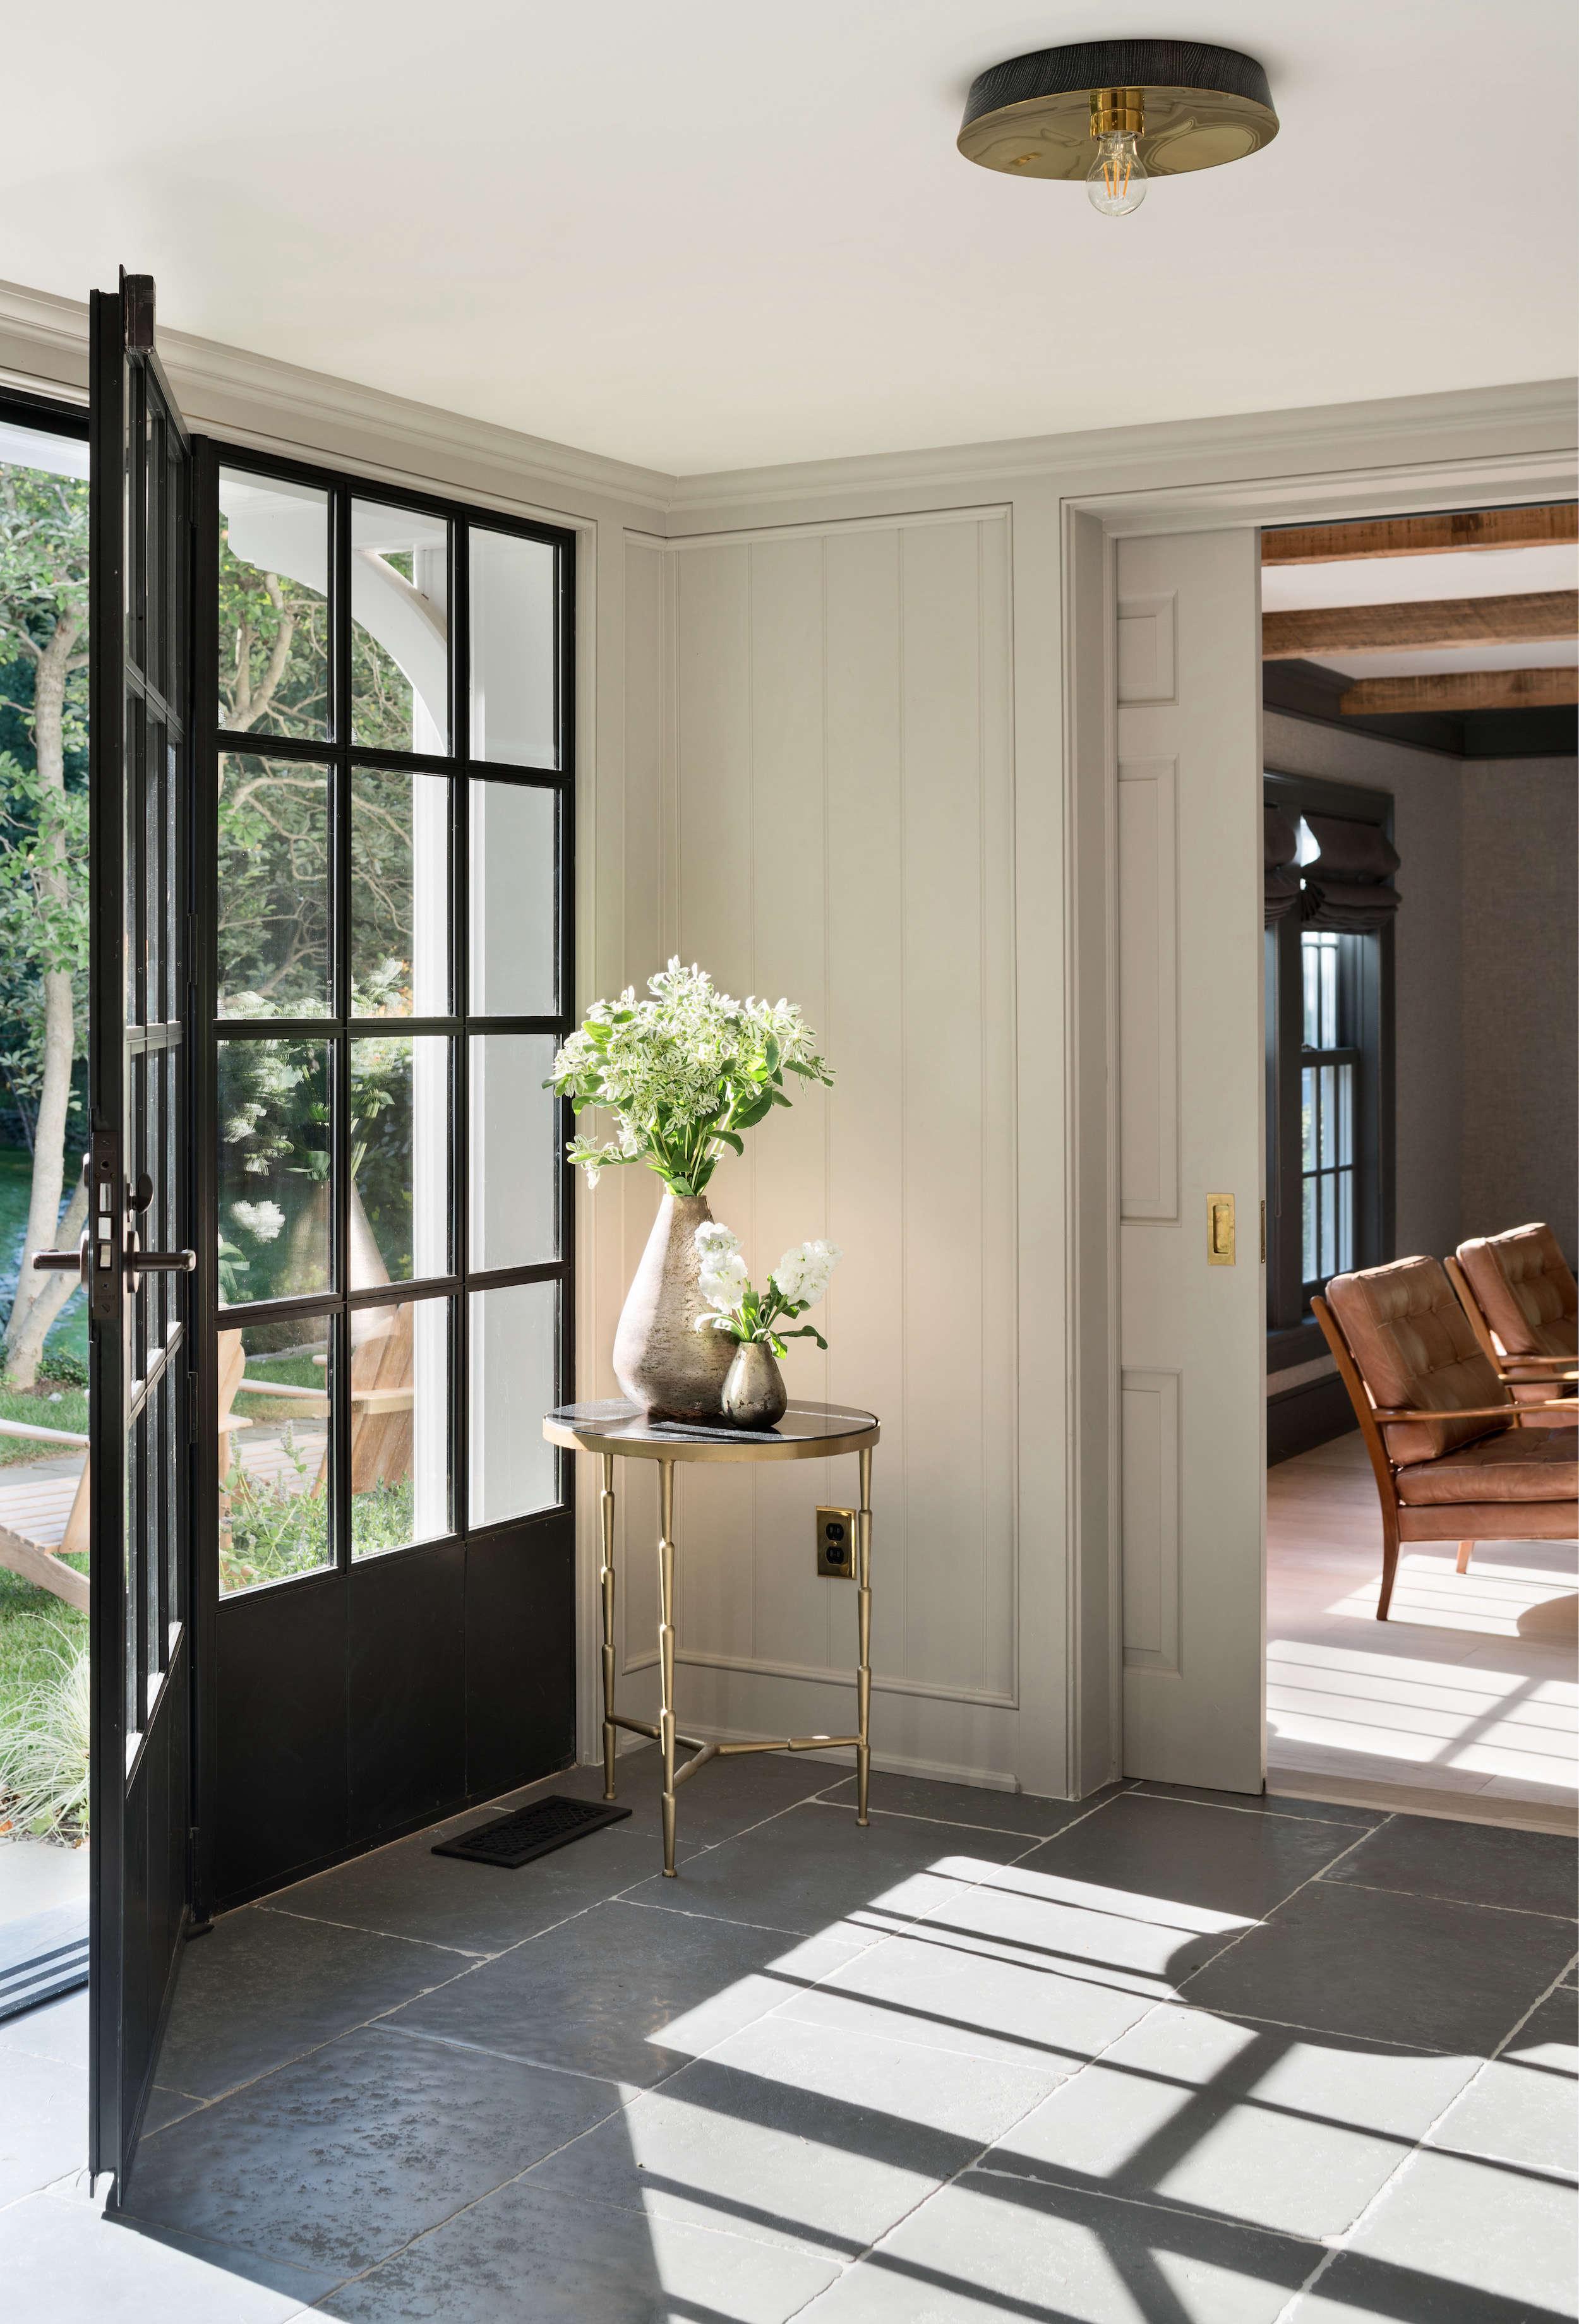 entryway-steel-windows-door-gray-tile-farmhouse-renovation